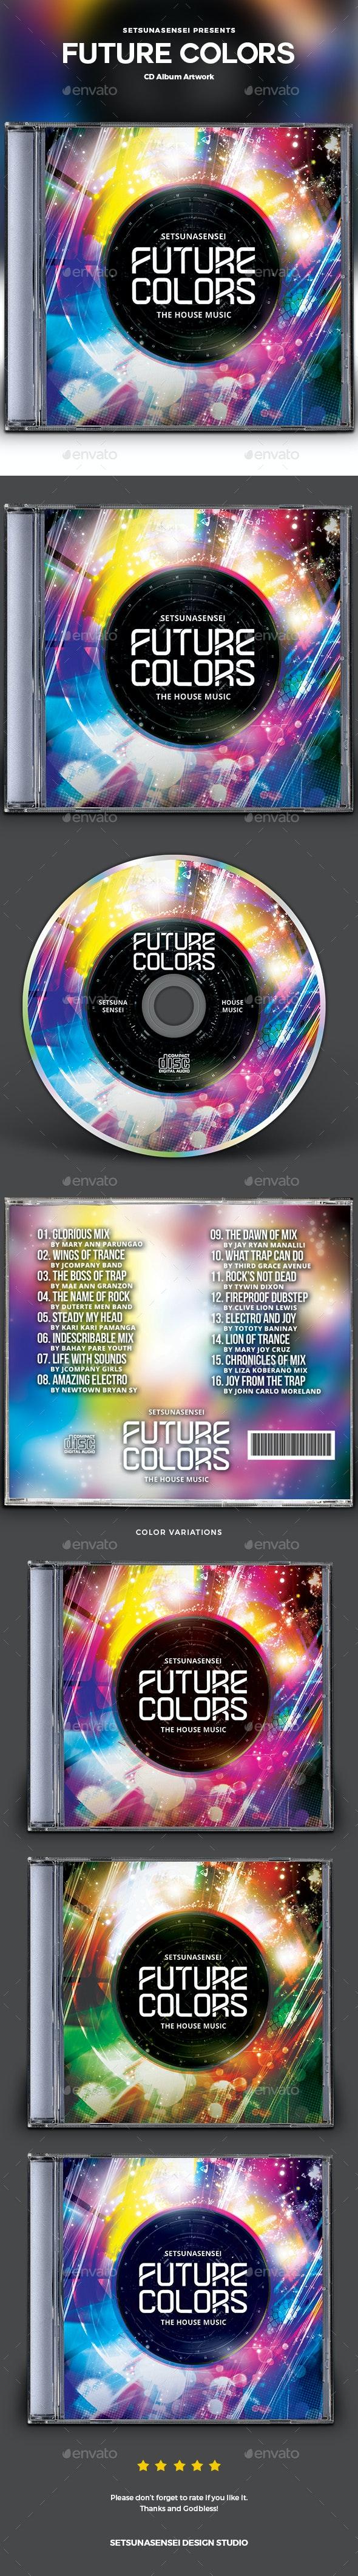 Future Colors CD Album Artwork - CD & DVD Artwork Print Templates